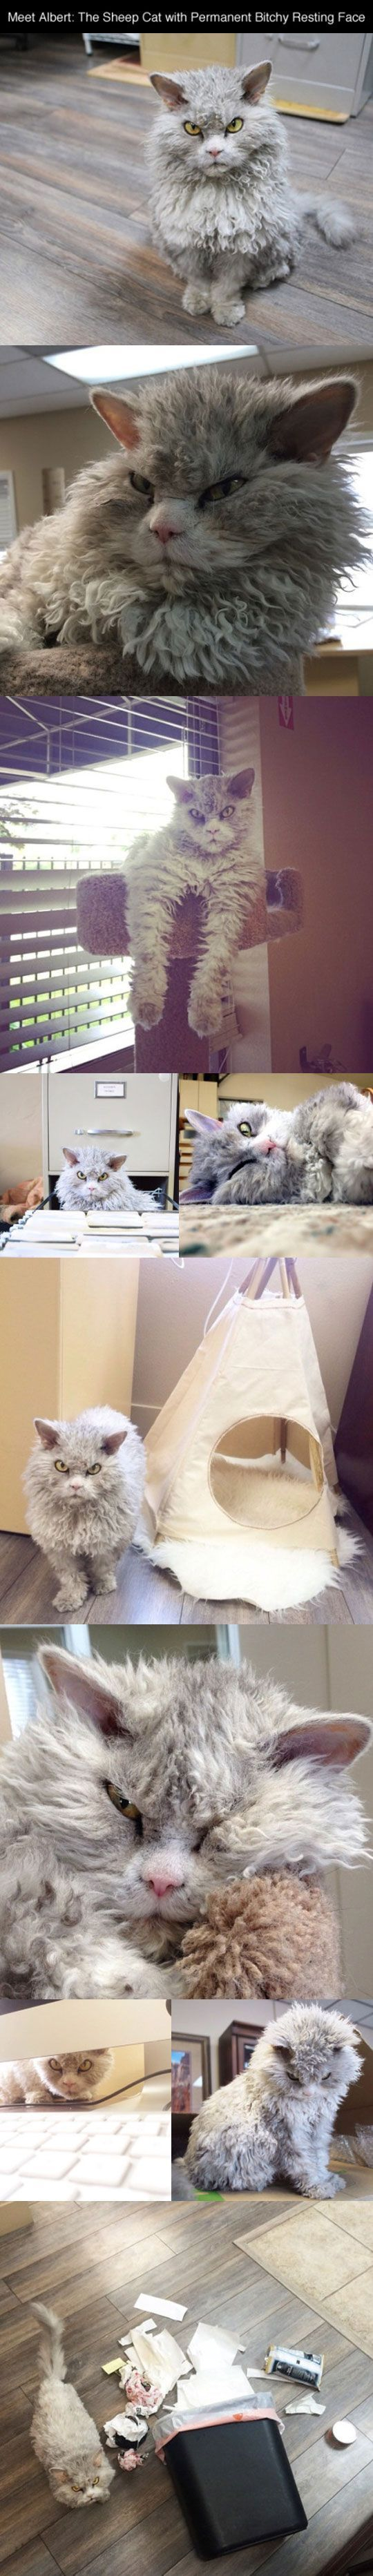 I need a cat like that